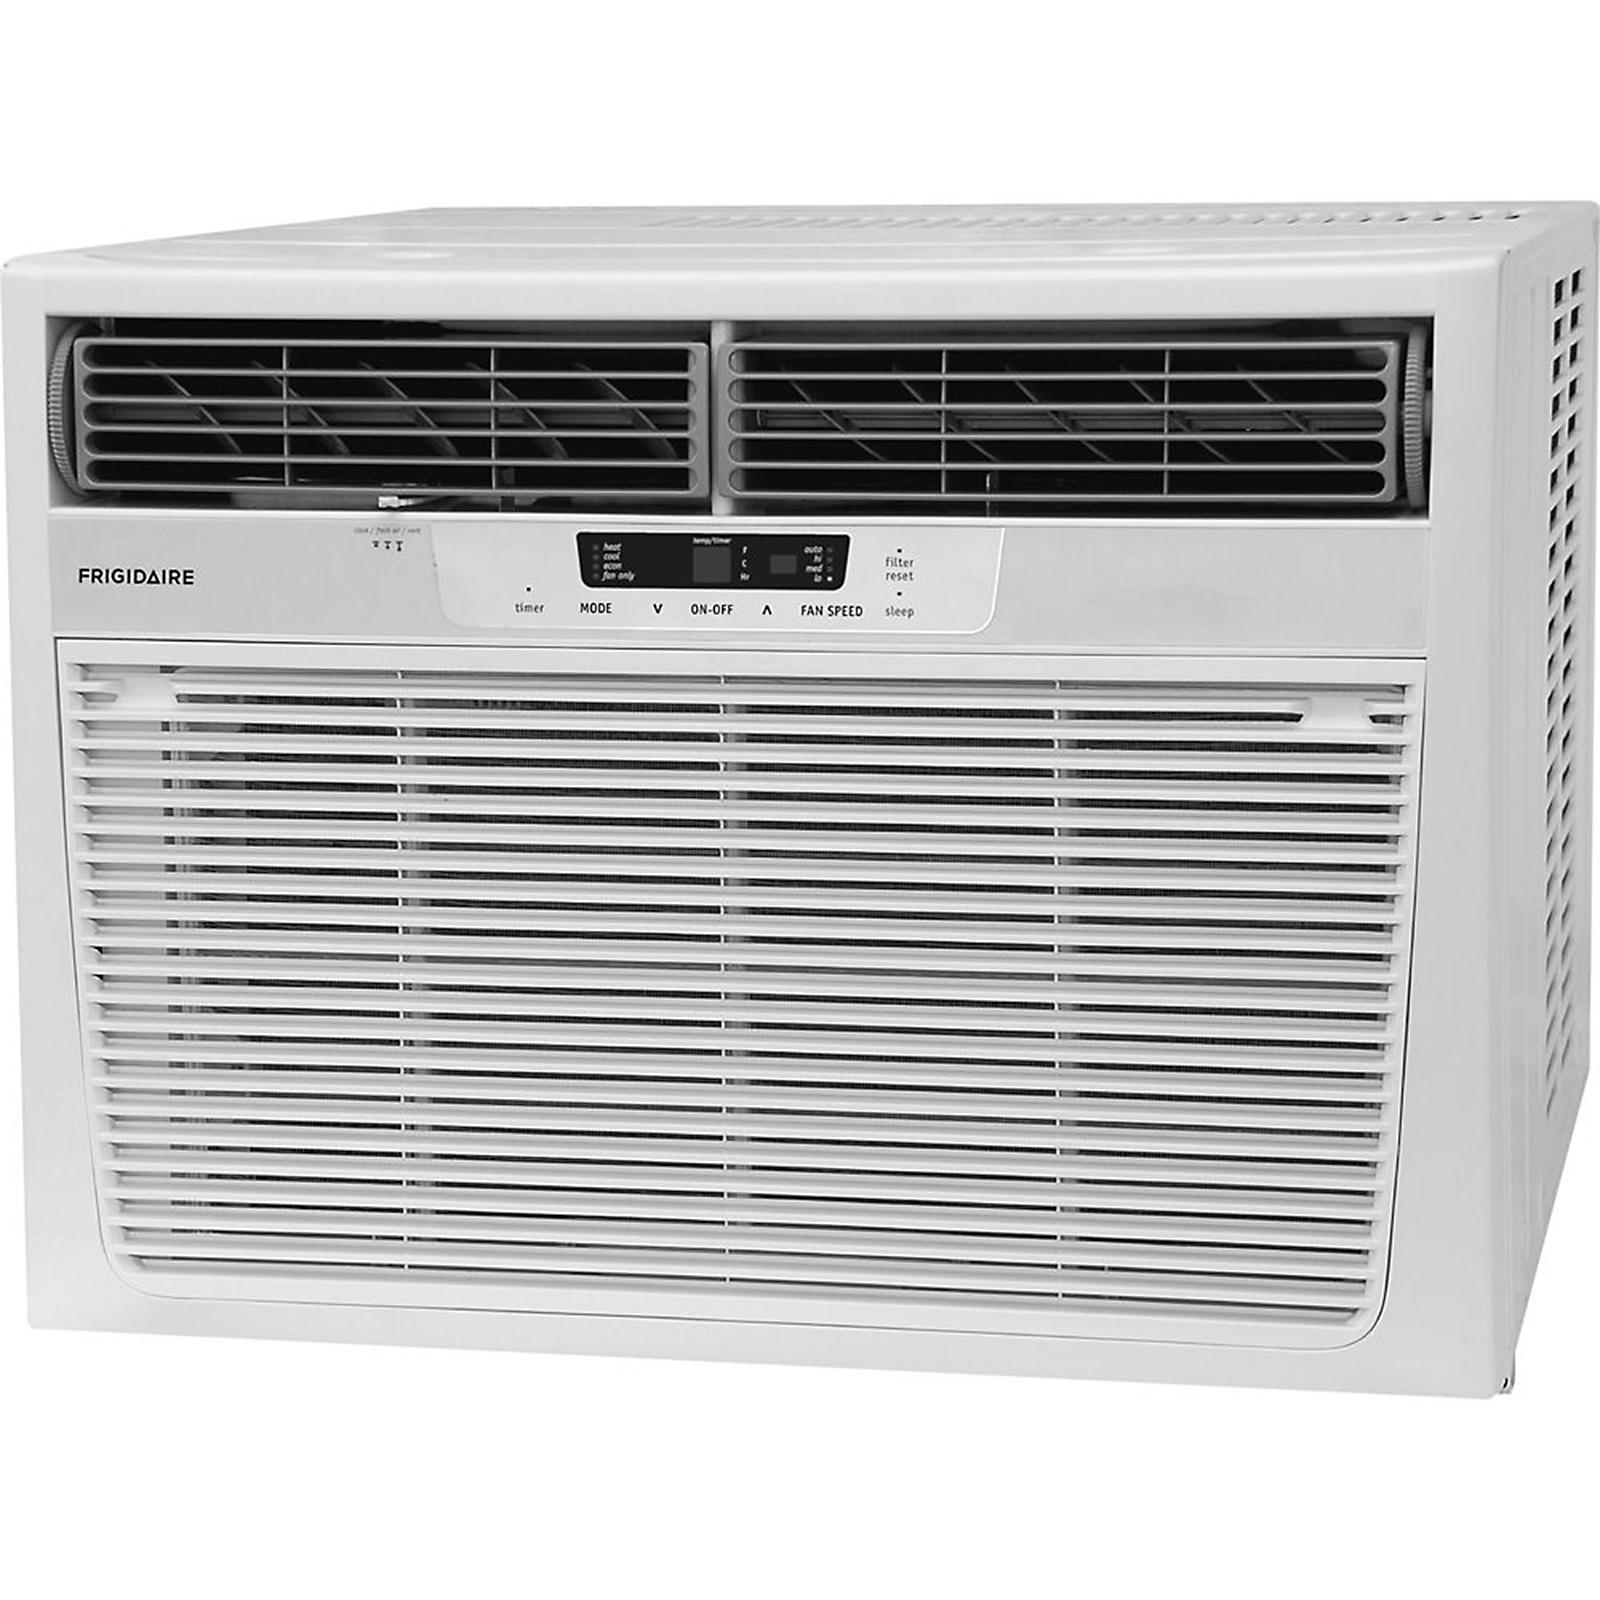 Frigidaire Fra18emu2 18 500 Btu 230-volt Window-mounted Median Air Conditioner With 16 000